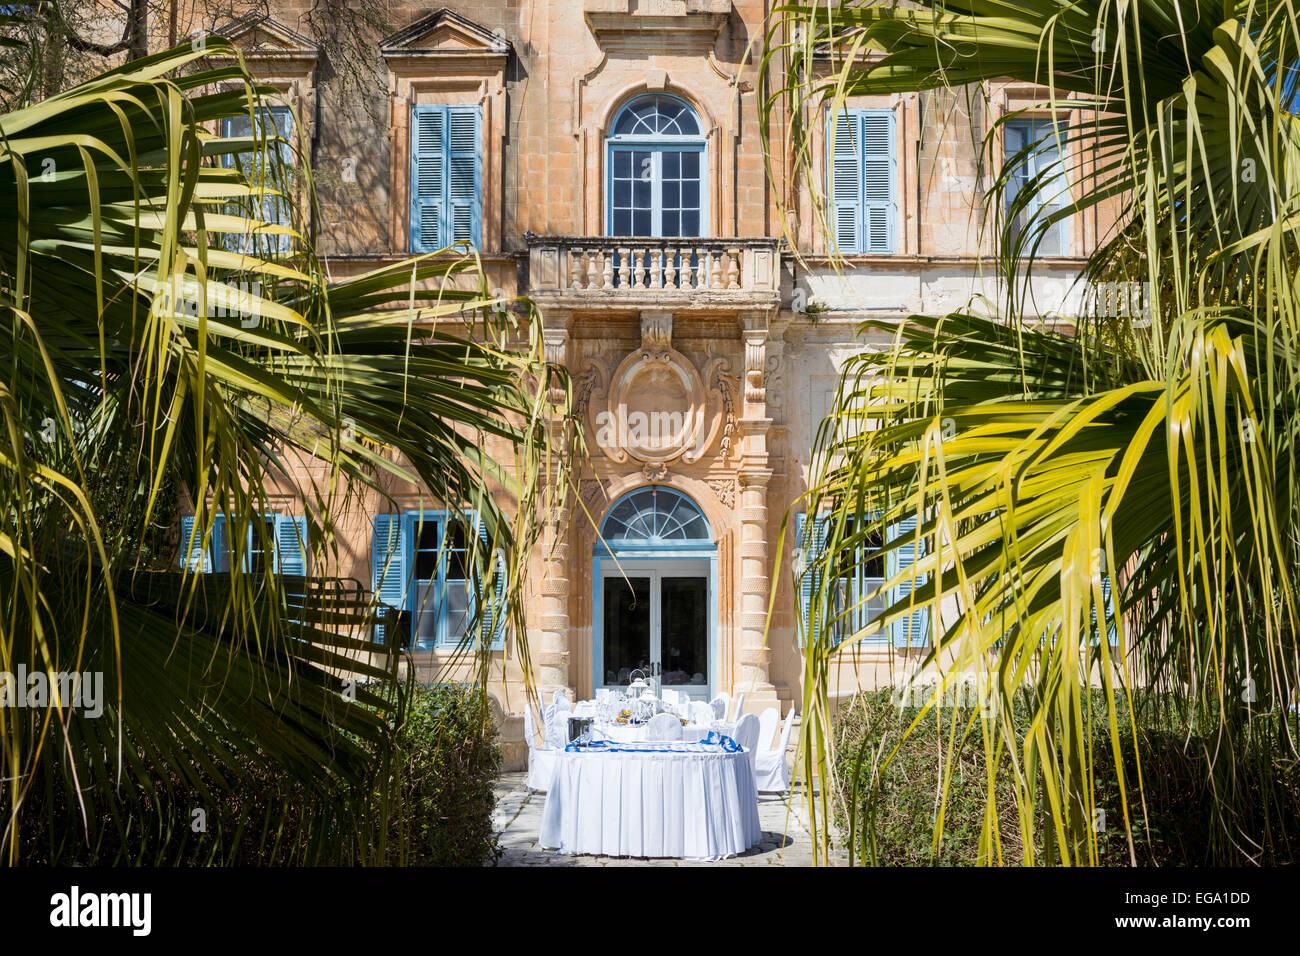 Wedding Venue Villa Bologna Attard Malta Stock Photo